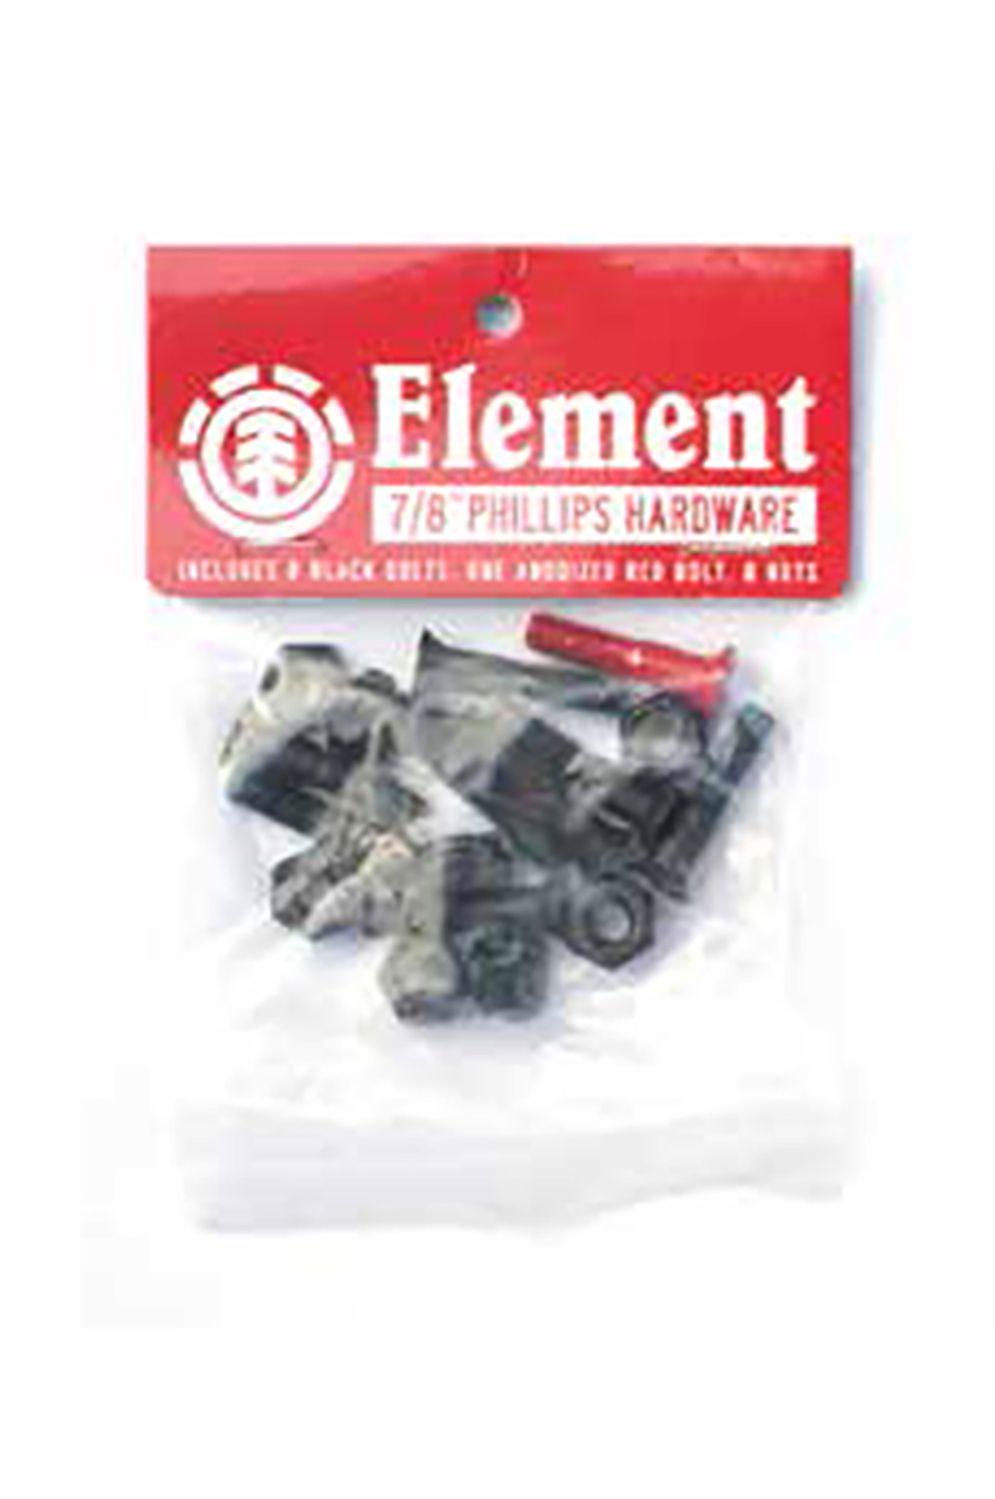 Element Screw PHLIPS HDWR 7-8 INCH Assorted